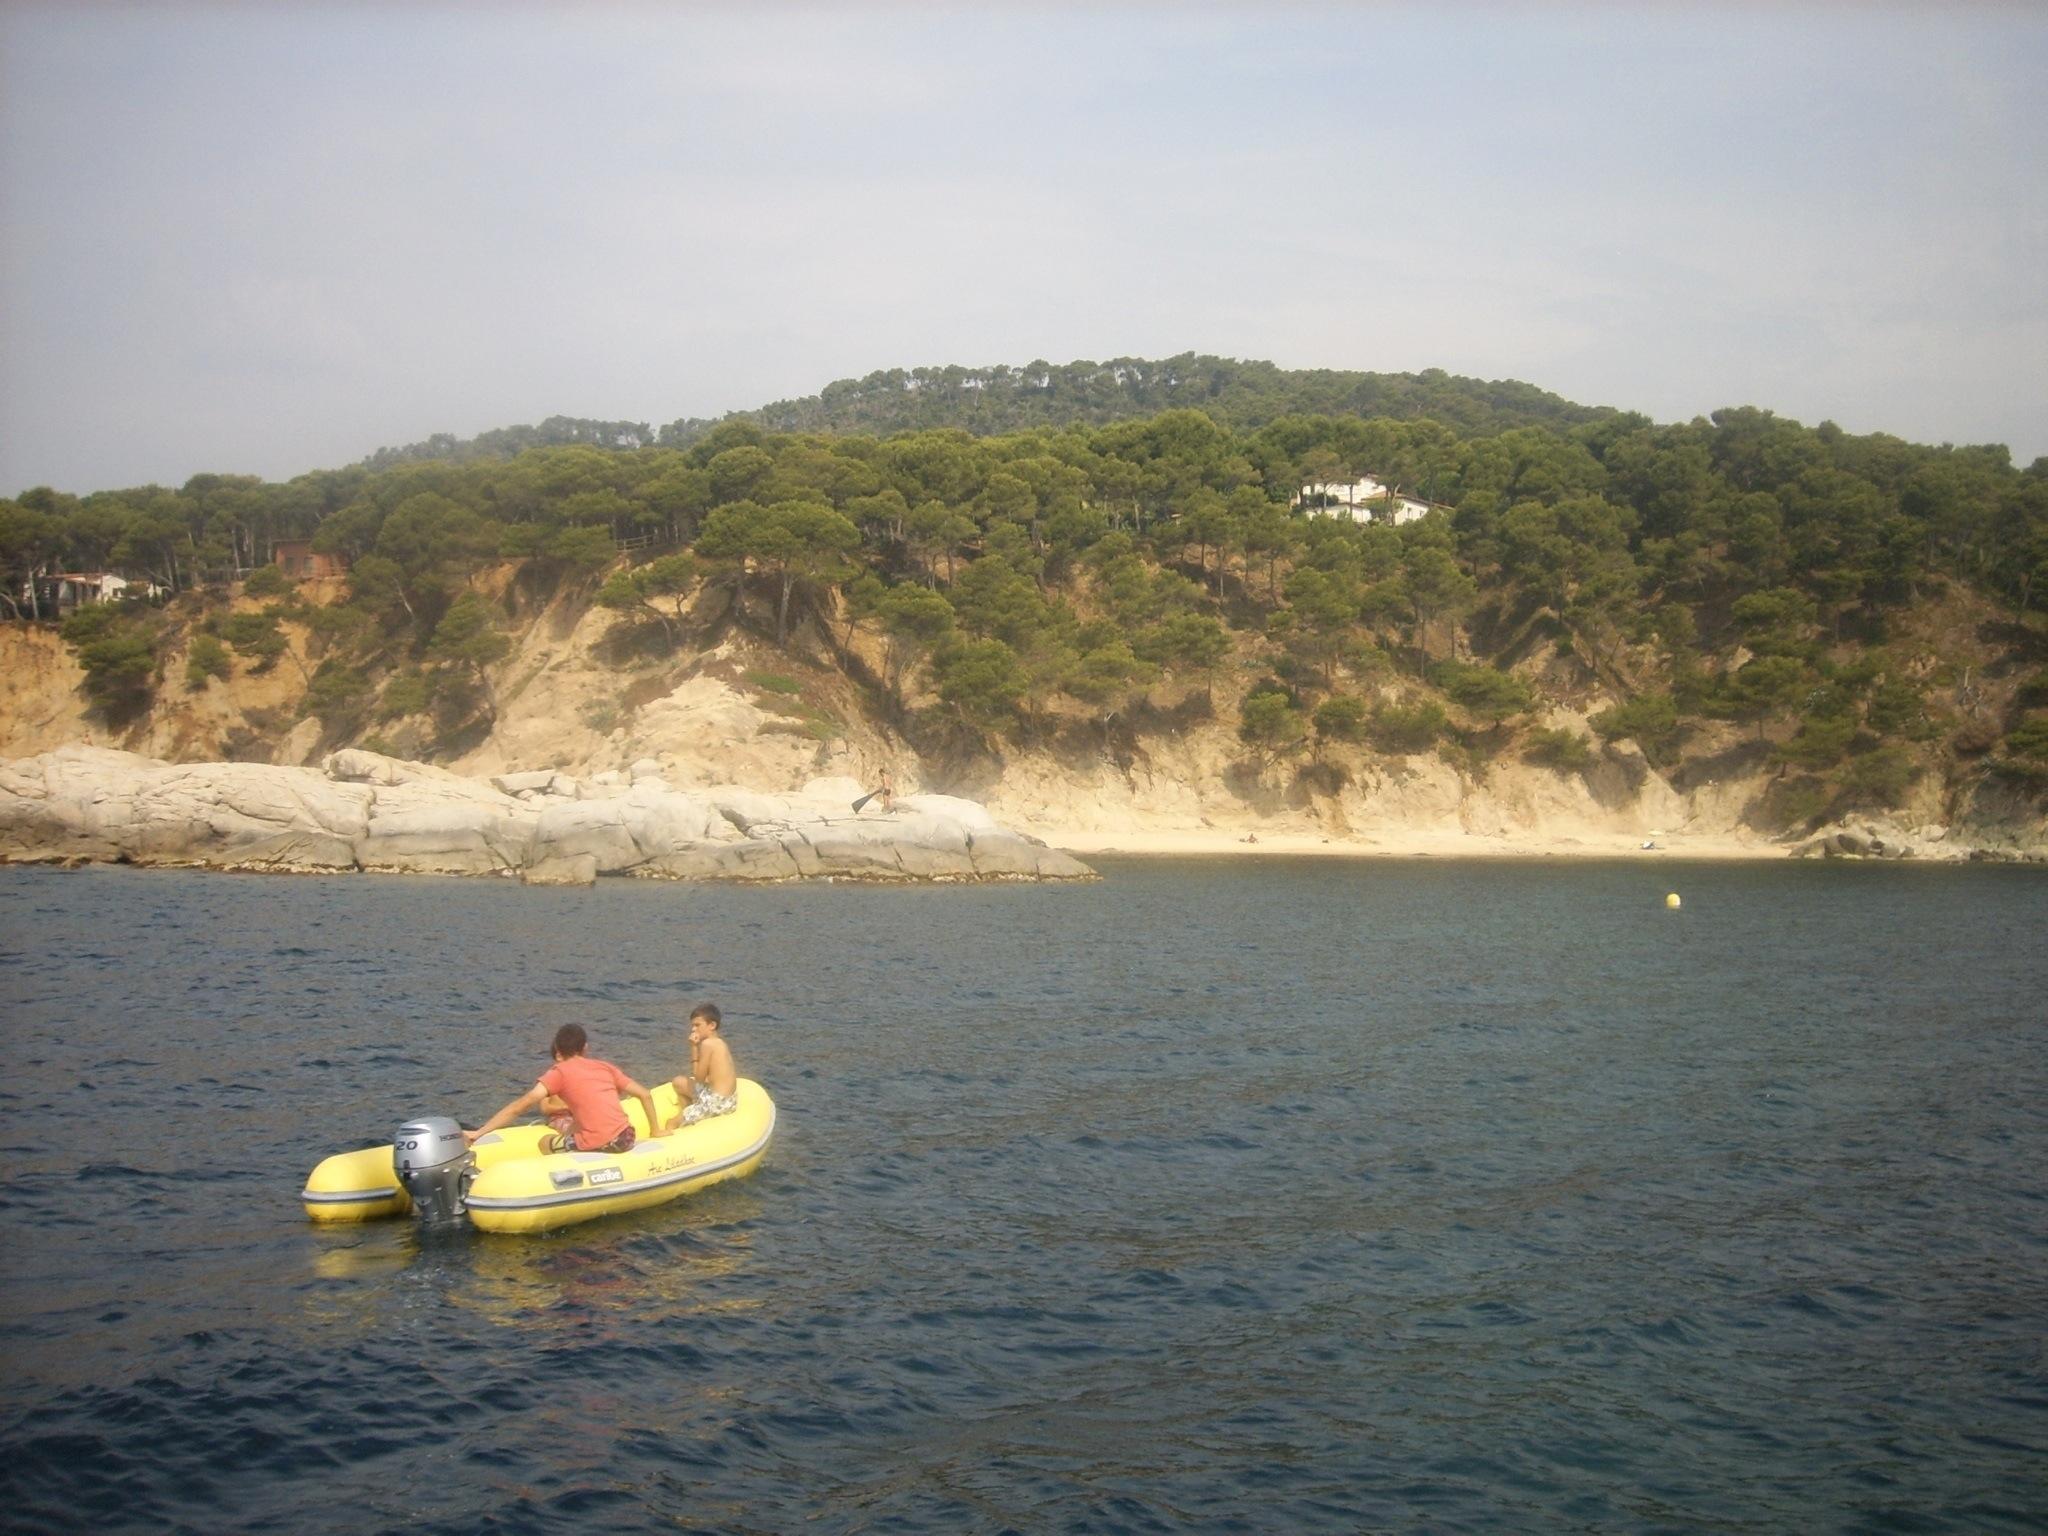 liladhoc catamaran outremer